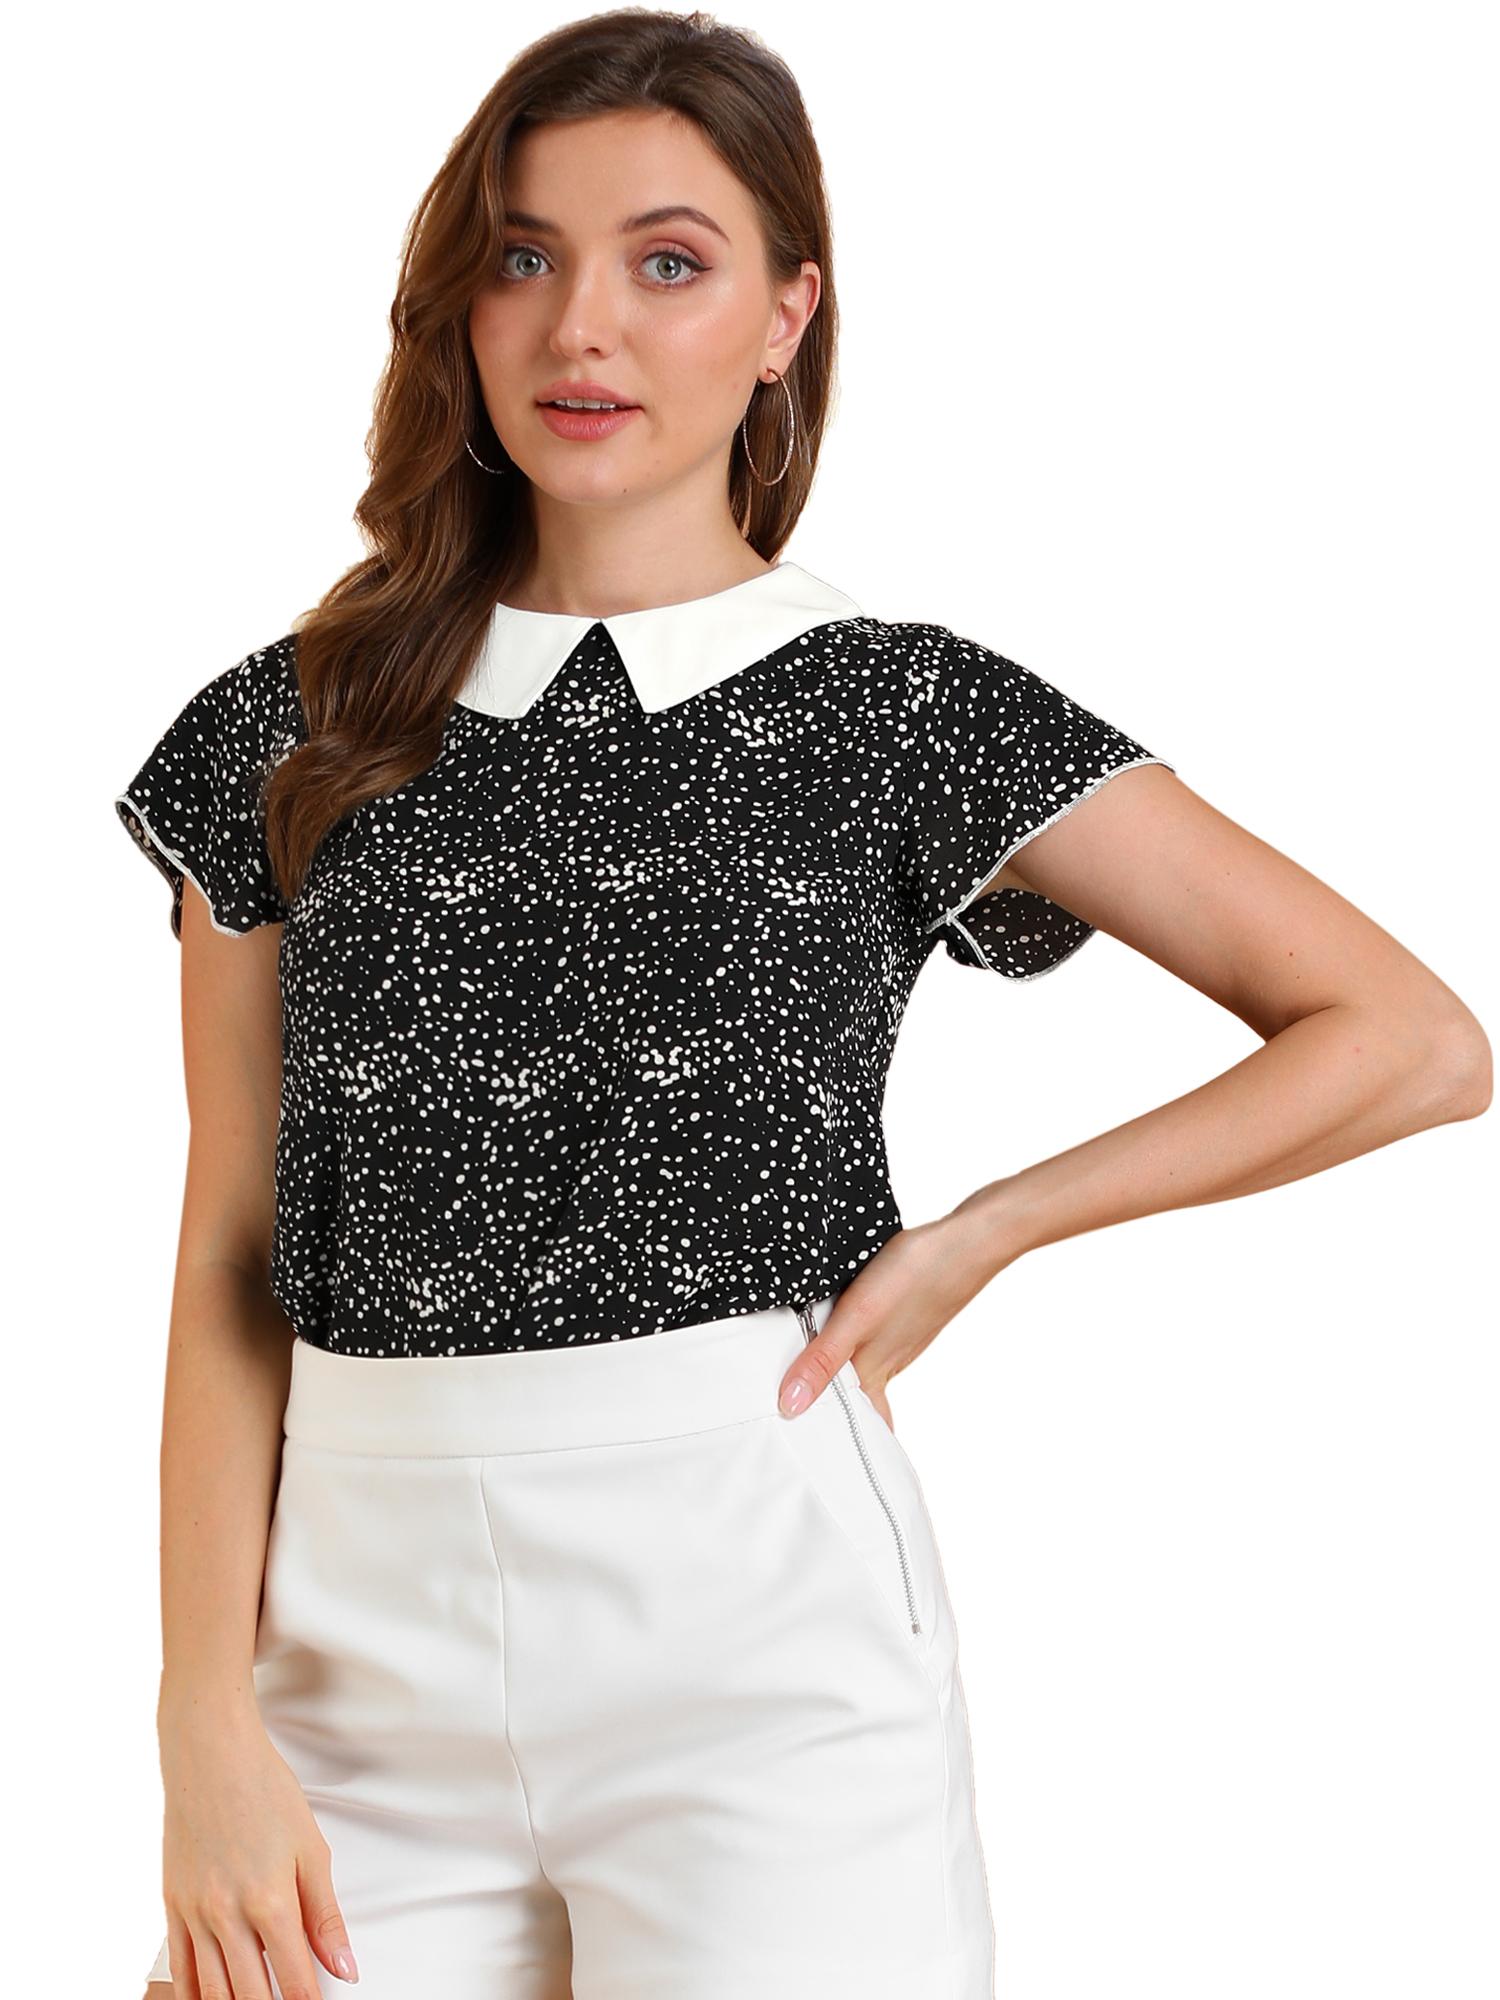 Allegra K Women's Irregular Polka Dots Contrast Collar Blouse Black L